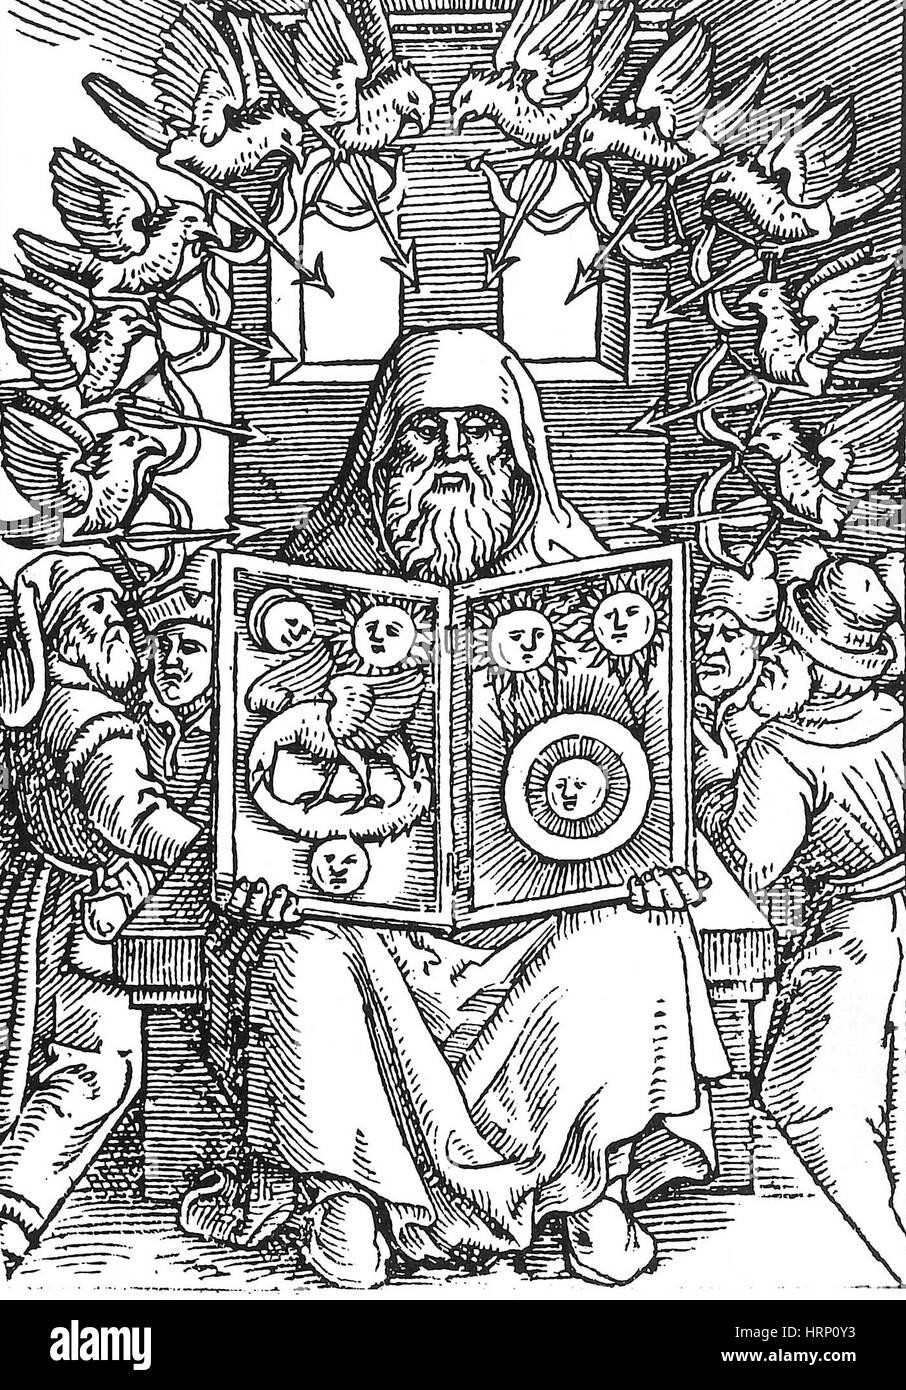 Hermes Trismegistus, Creator of Hermeticism - Stock Image